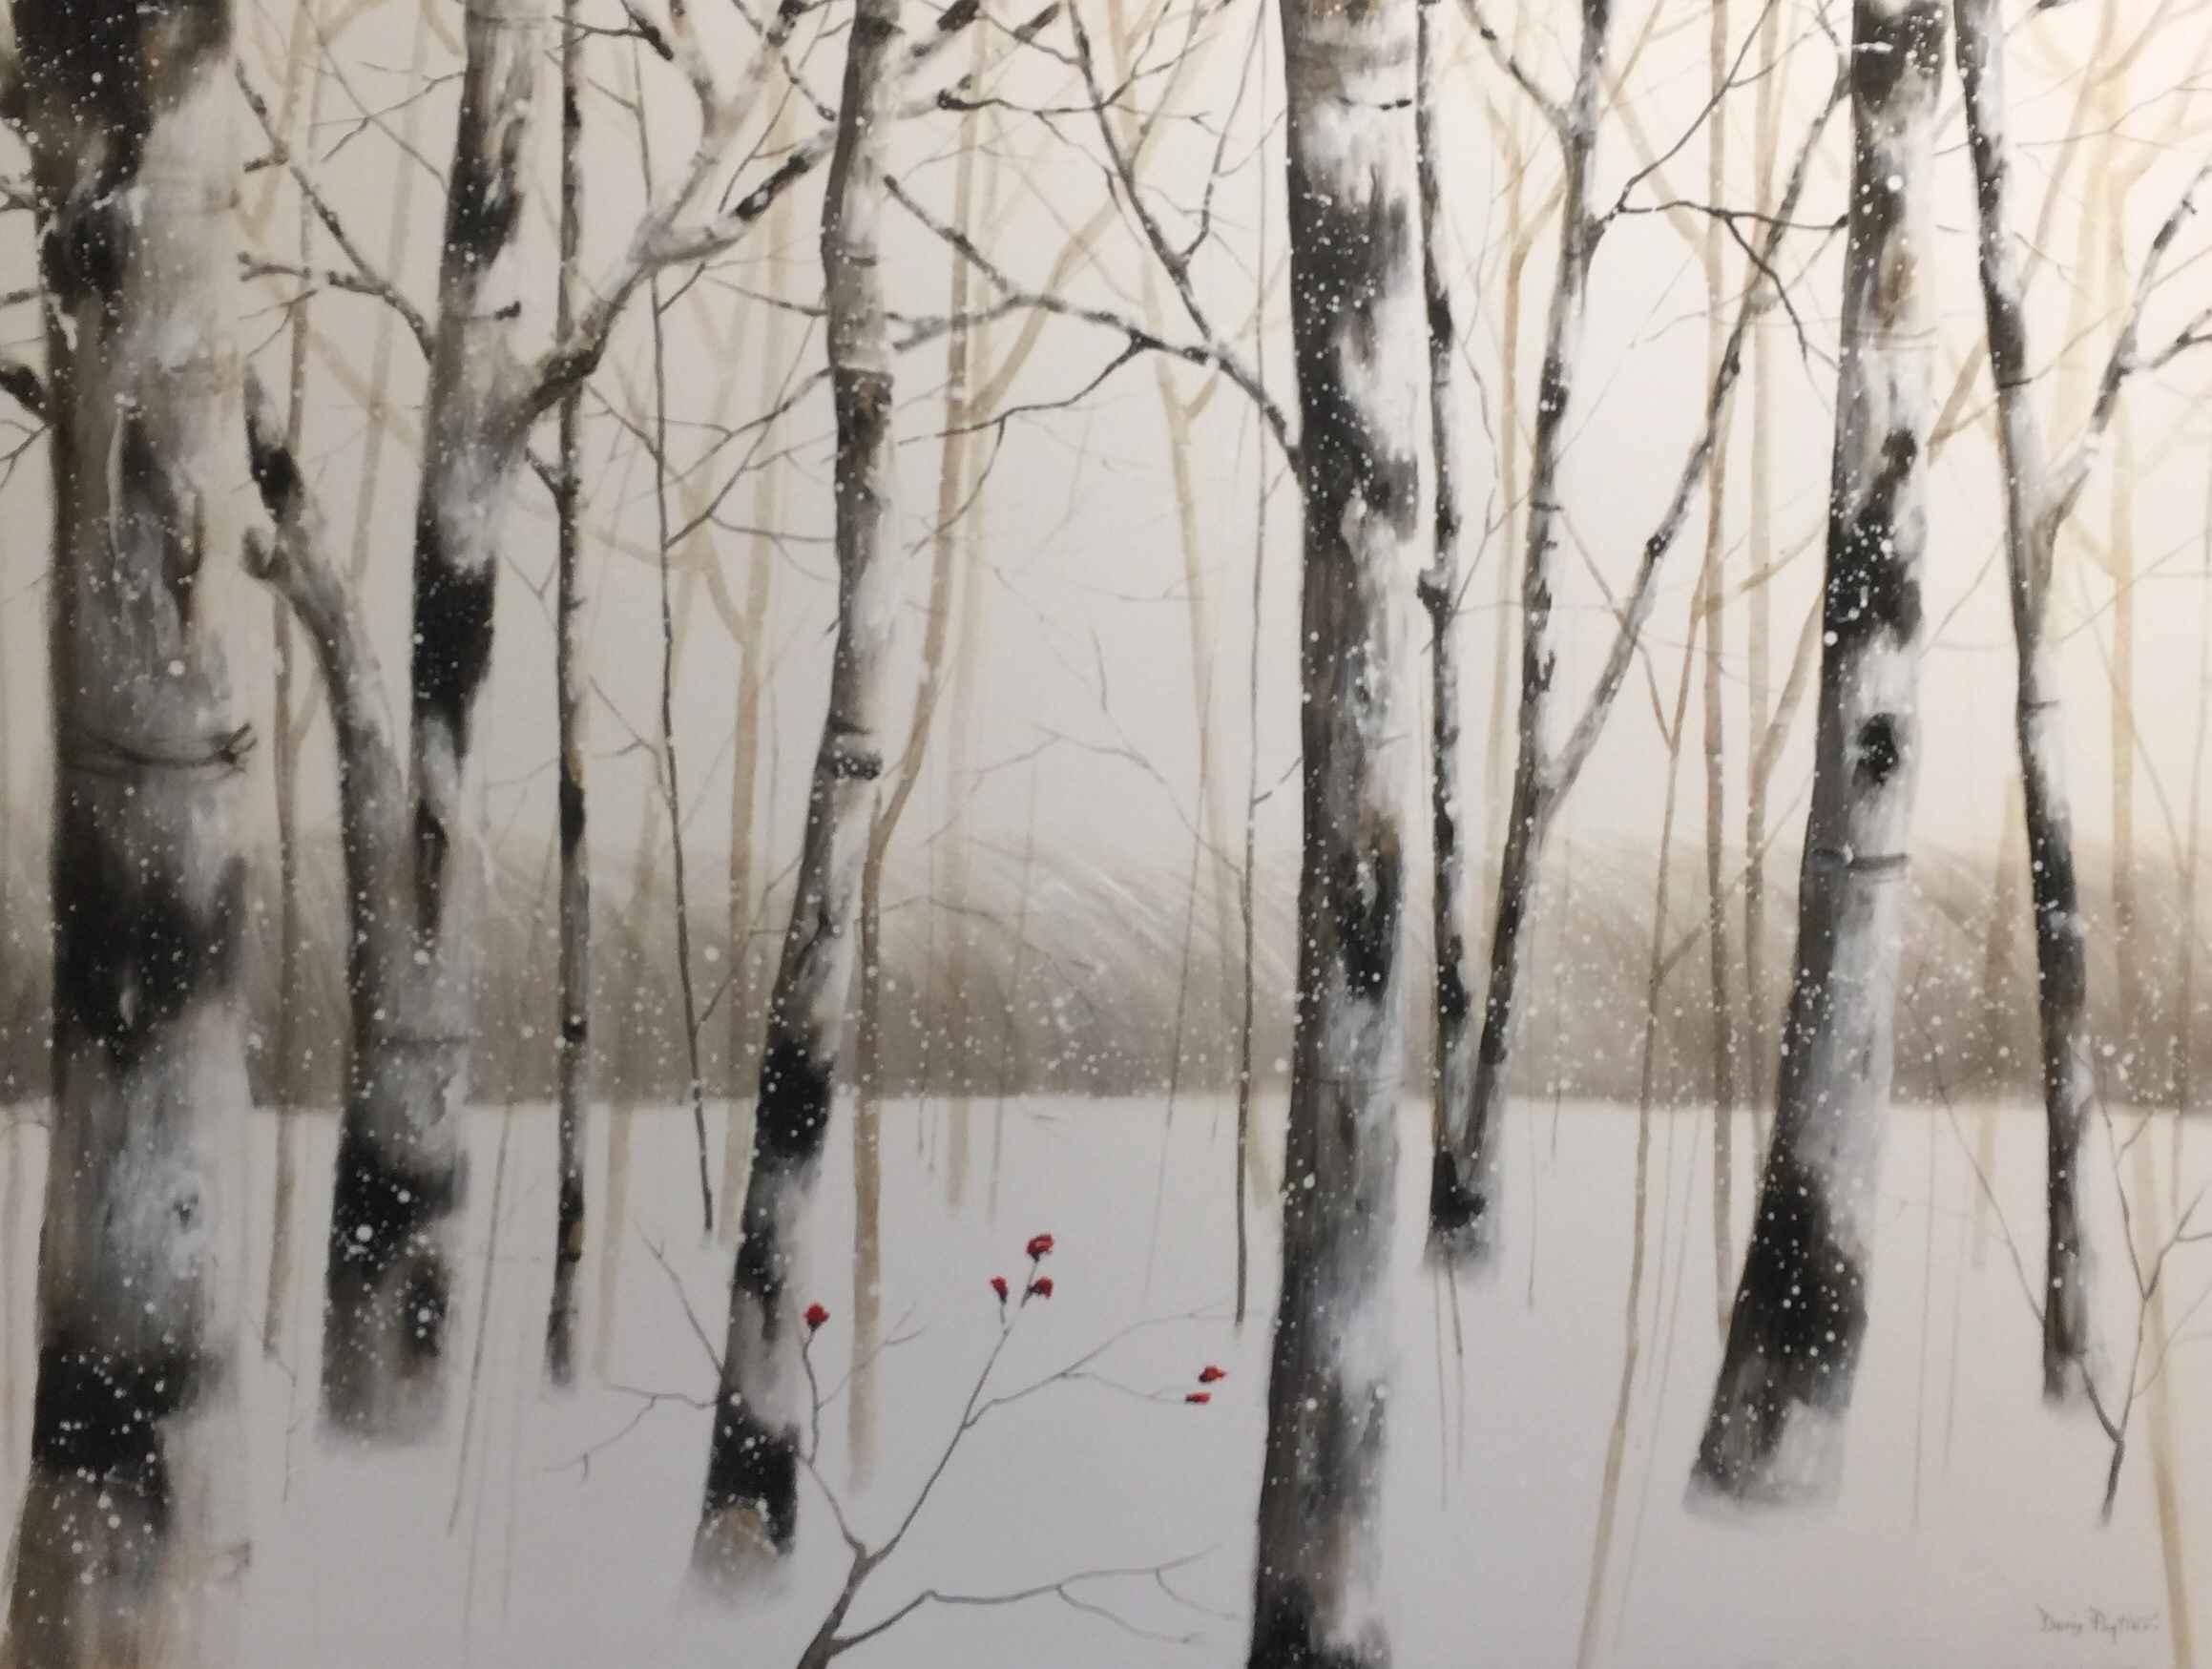 Prelude To Spring by  Doris Pontieri - Masterpiece Online